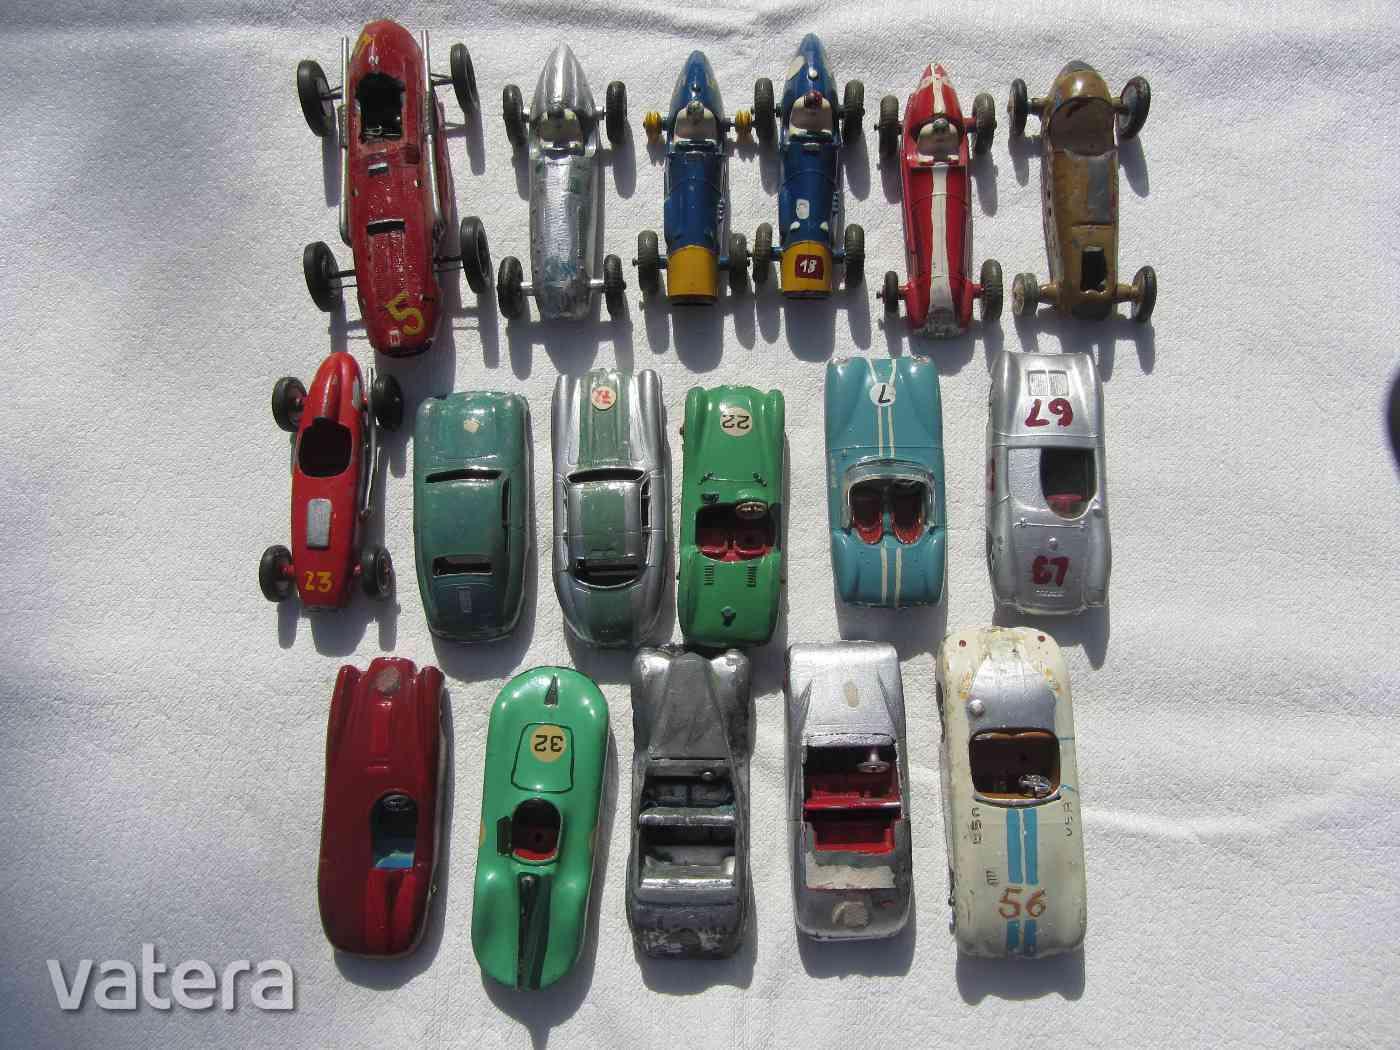 otvenes-evekbol-auto-modellek-felujitoknak-716a_1_big.jpg